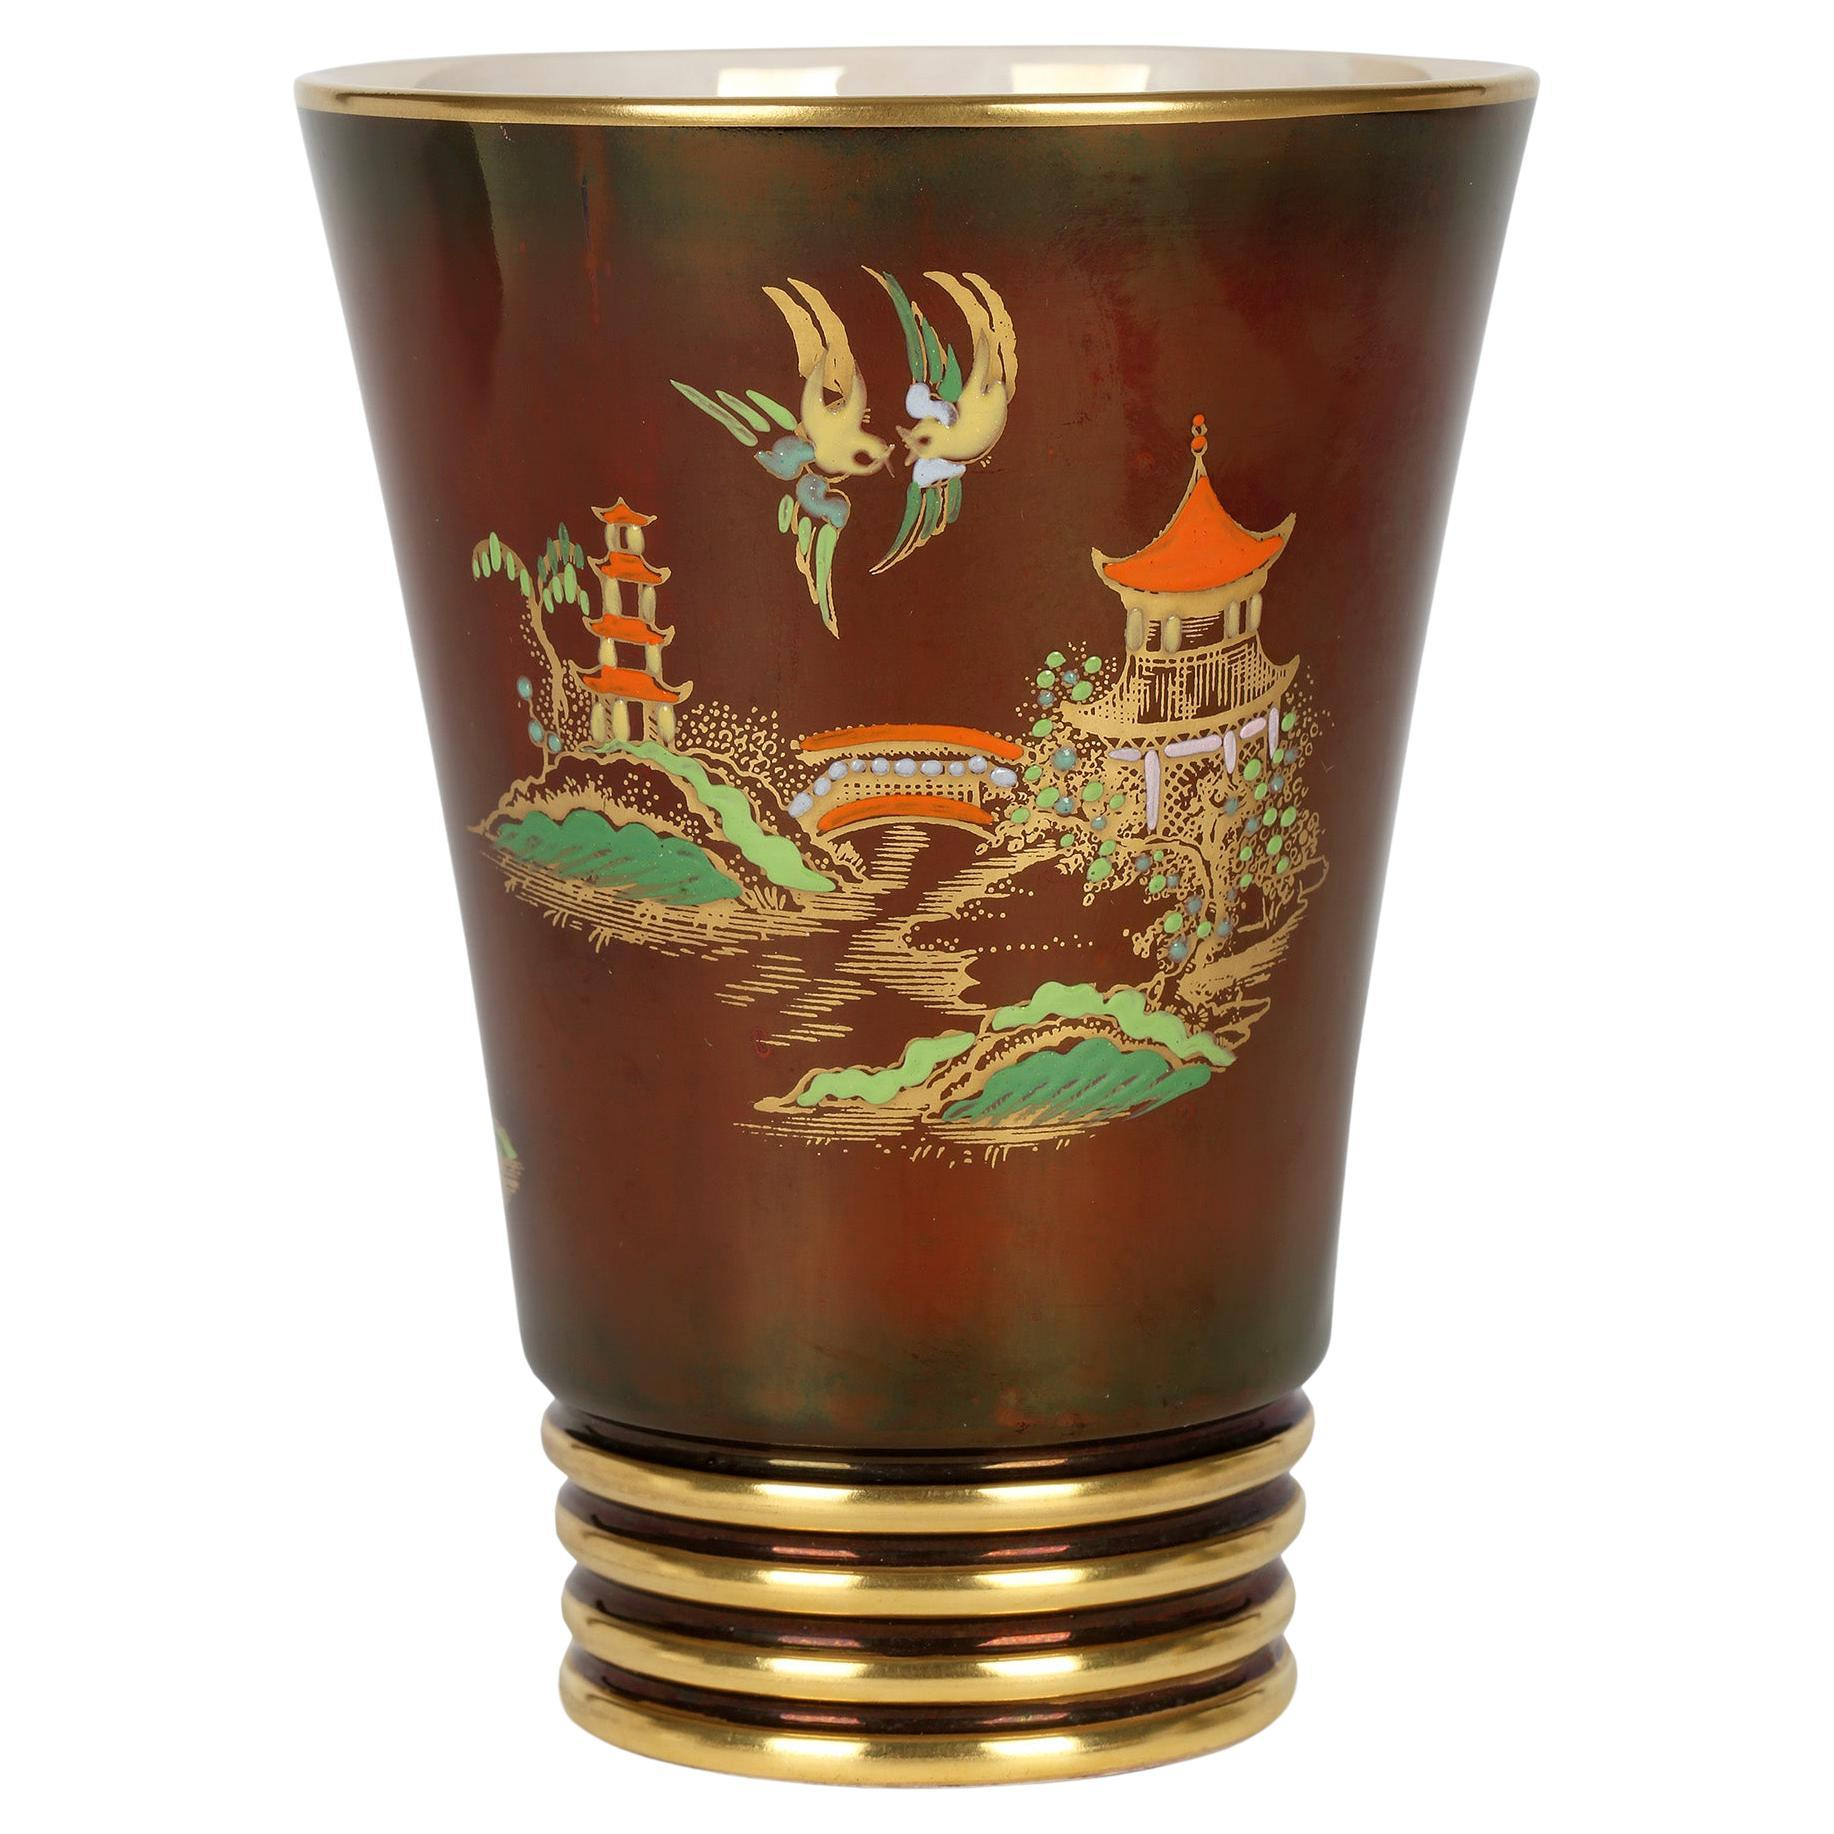 Carlton Ware Art Deco Rouge Royal Lustre Mikado Pattern Pottery Vase